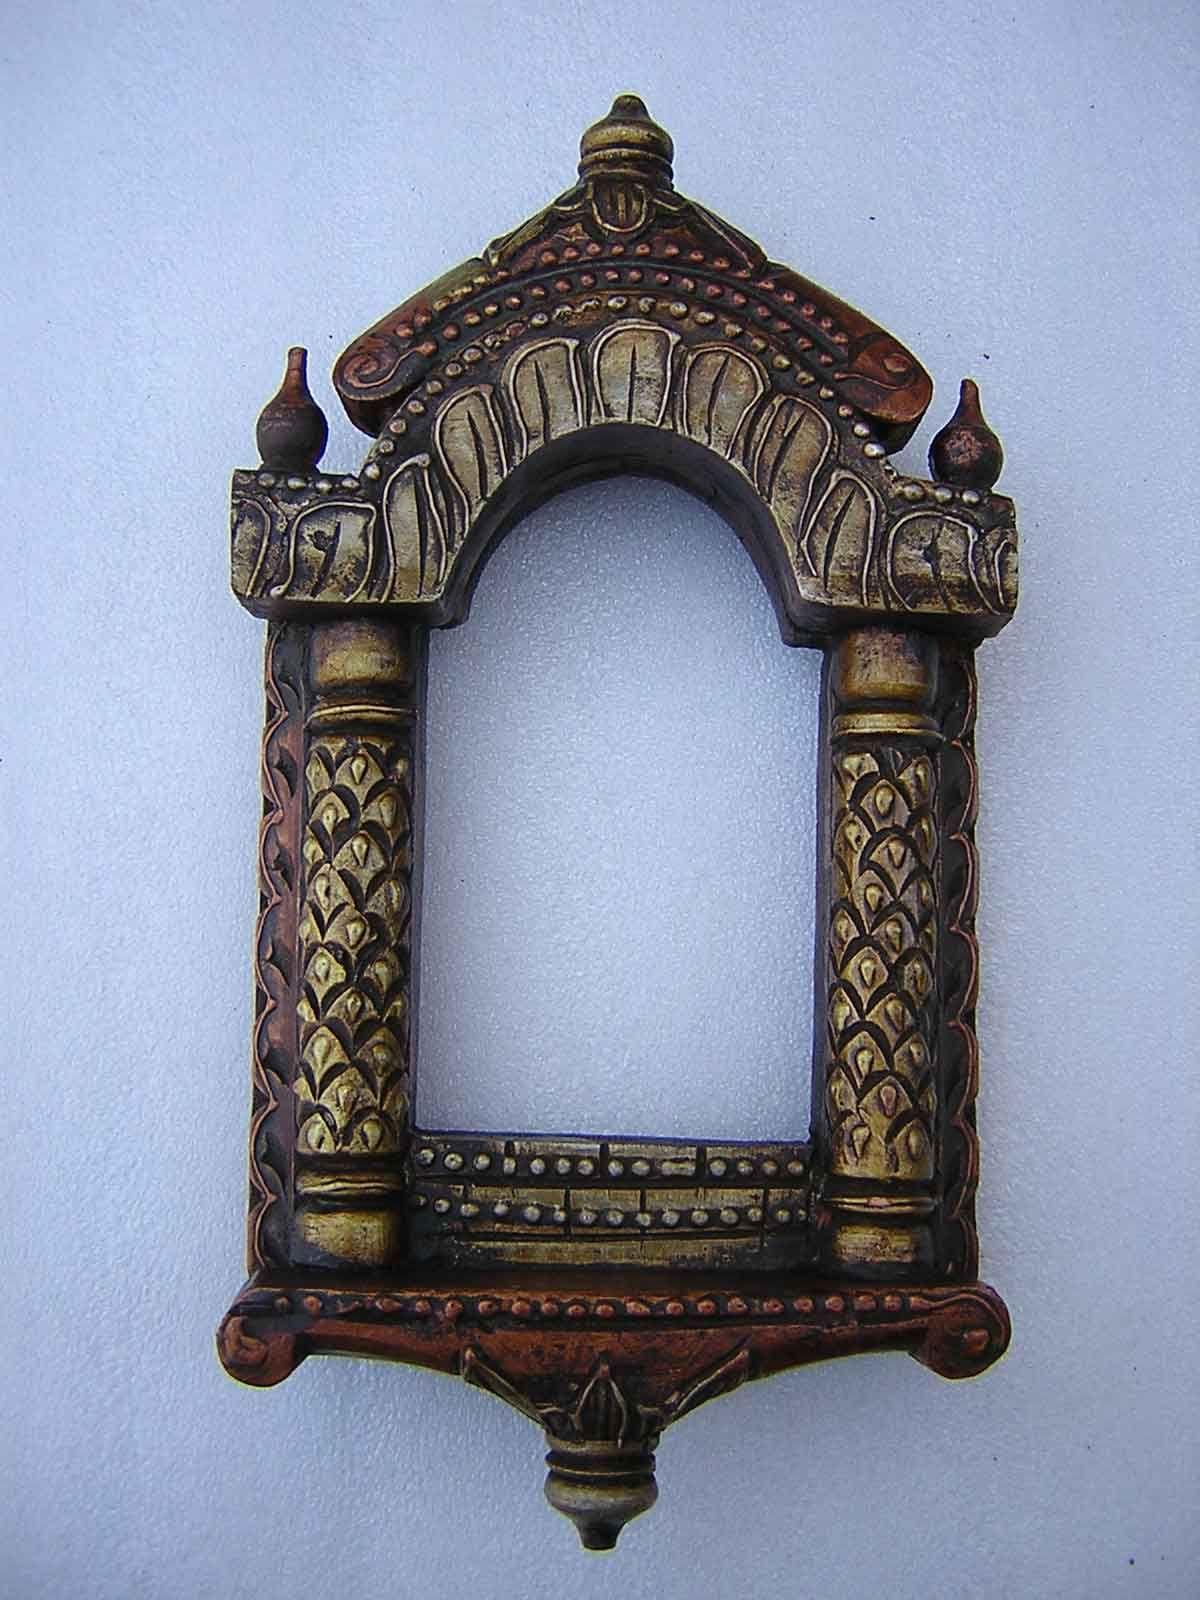 jharokha | craft | Pinterest | Handicraft, Terracotta and ...